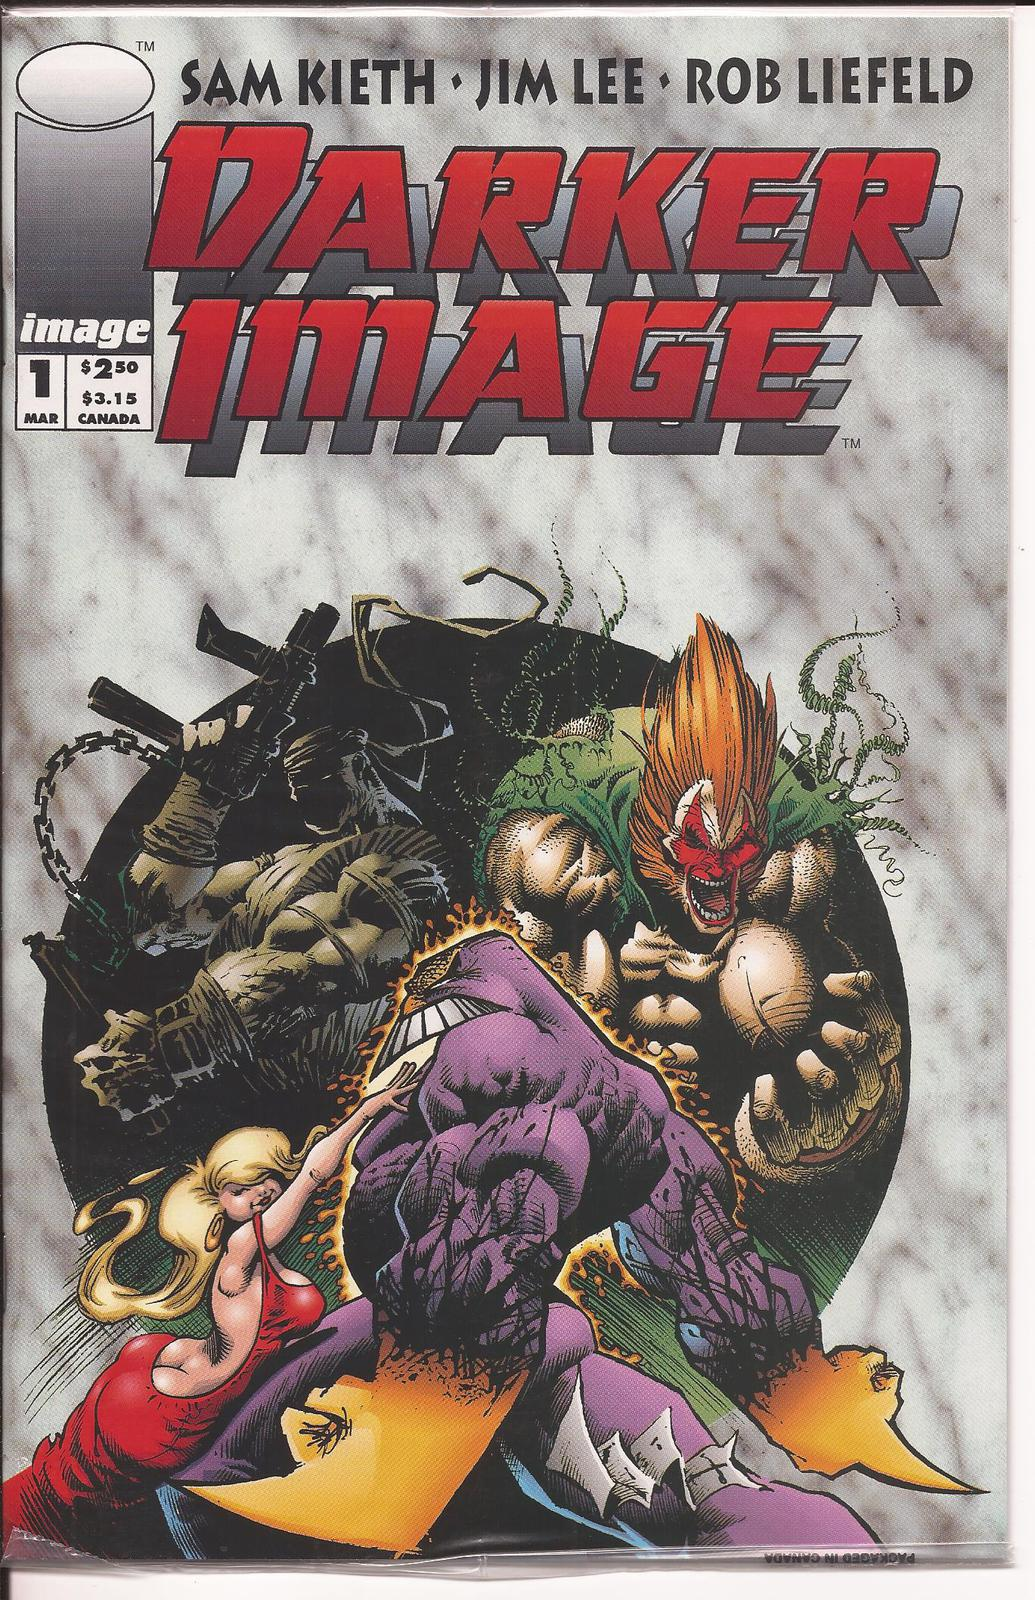 Image Comics Darker Image 1 Sam Keith Jim Lee Rob Liefeld